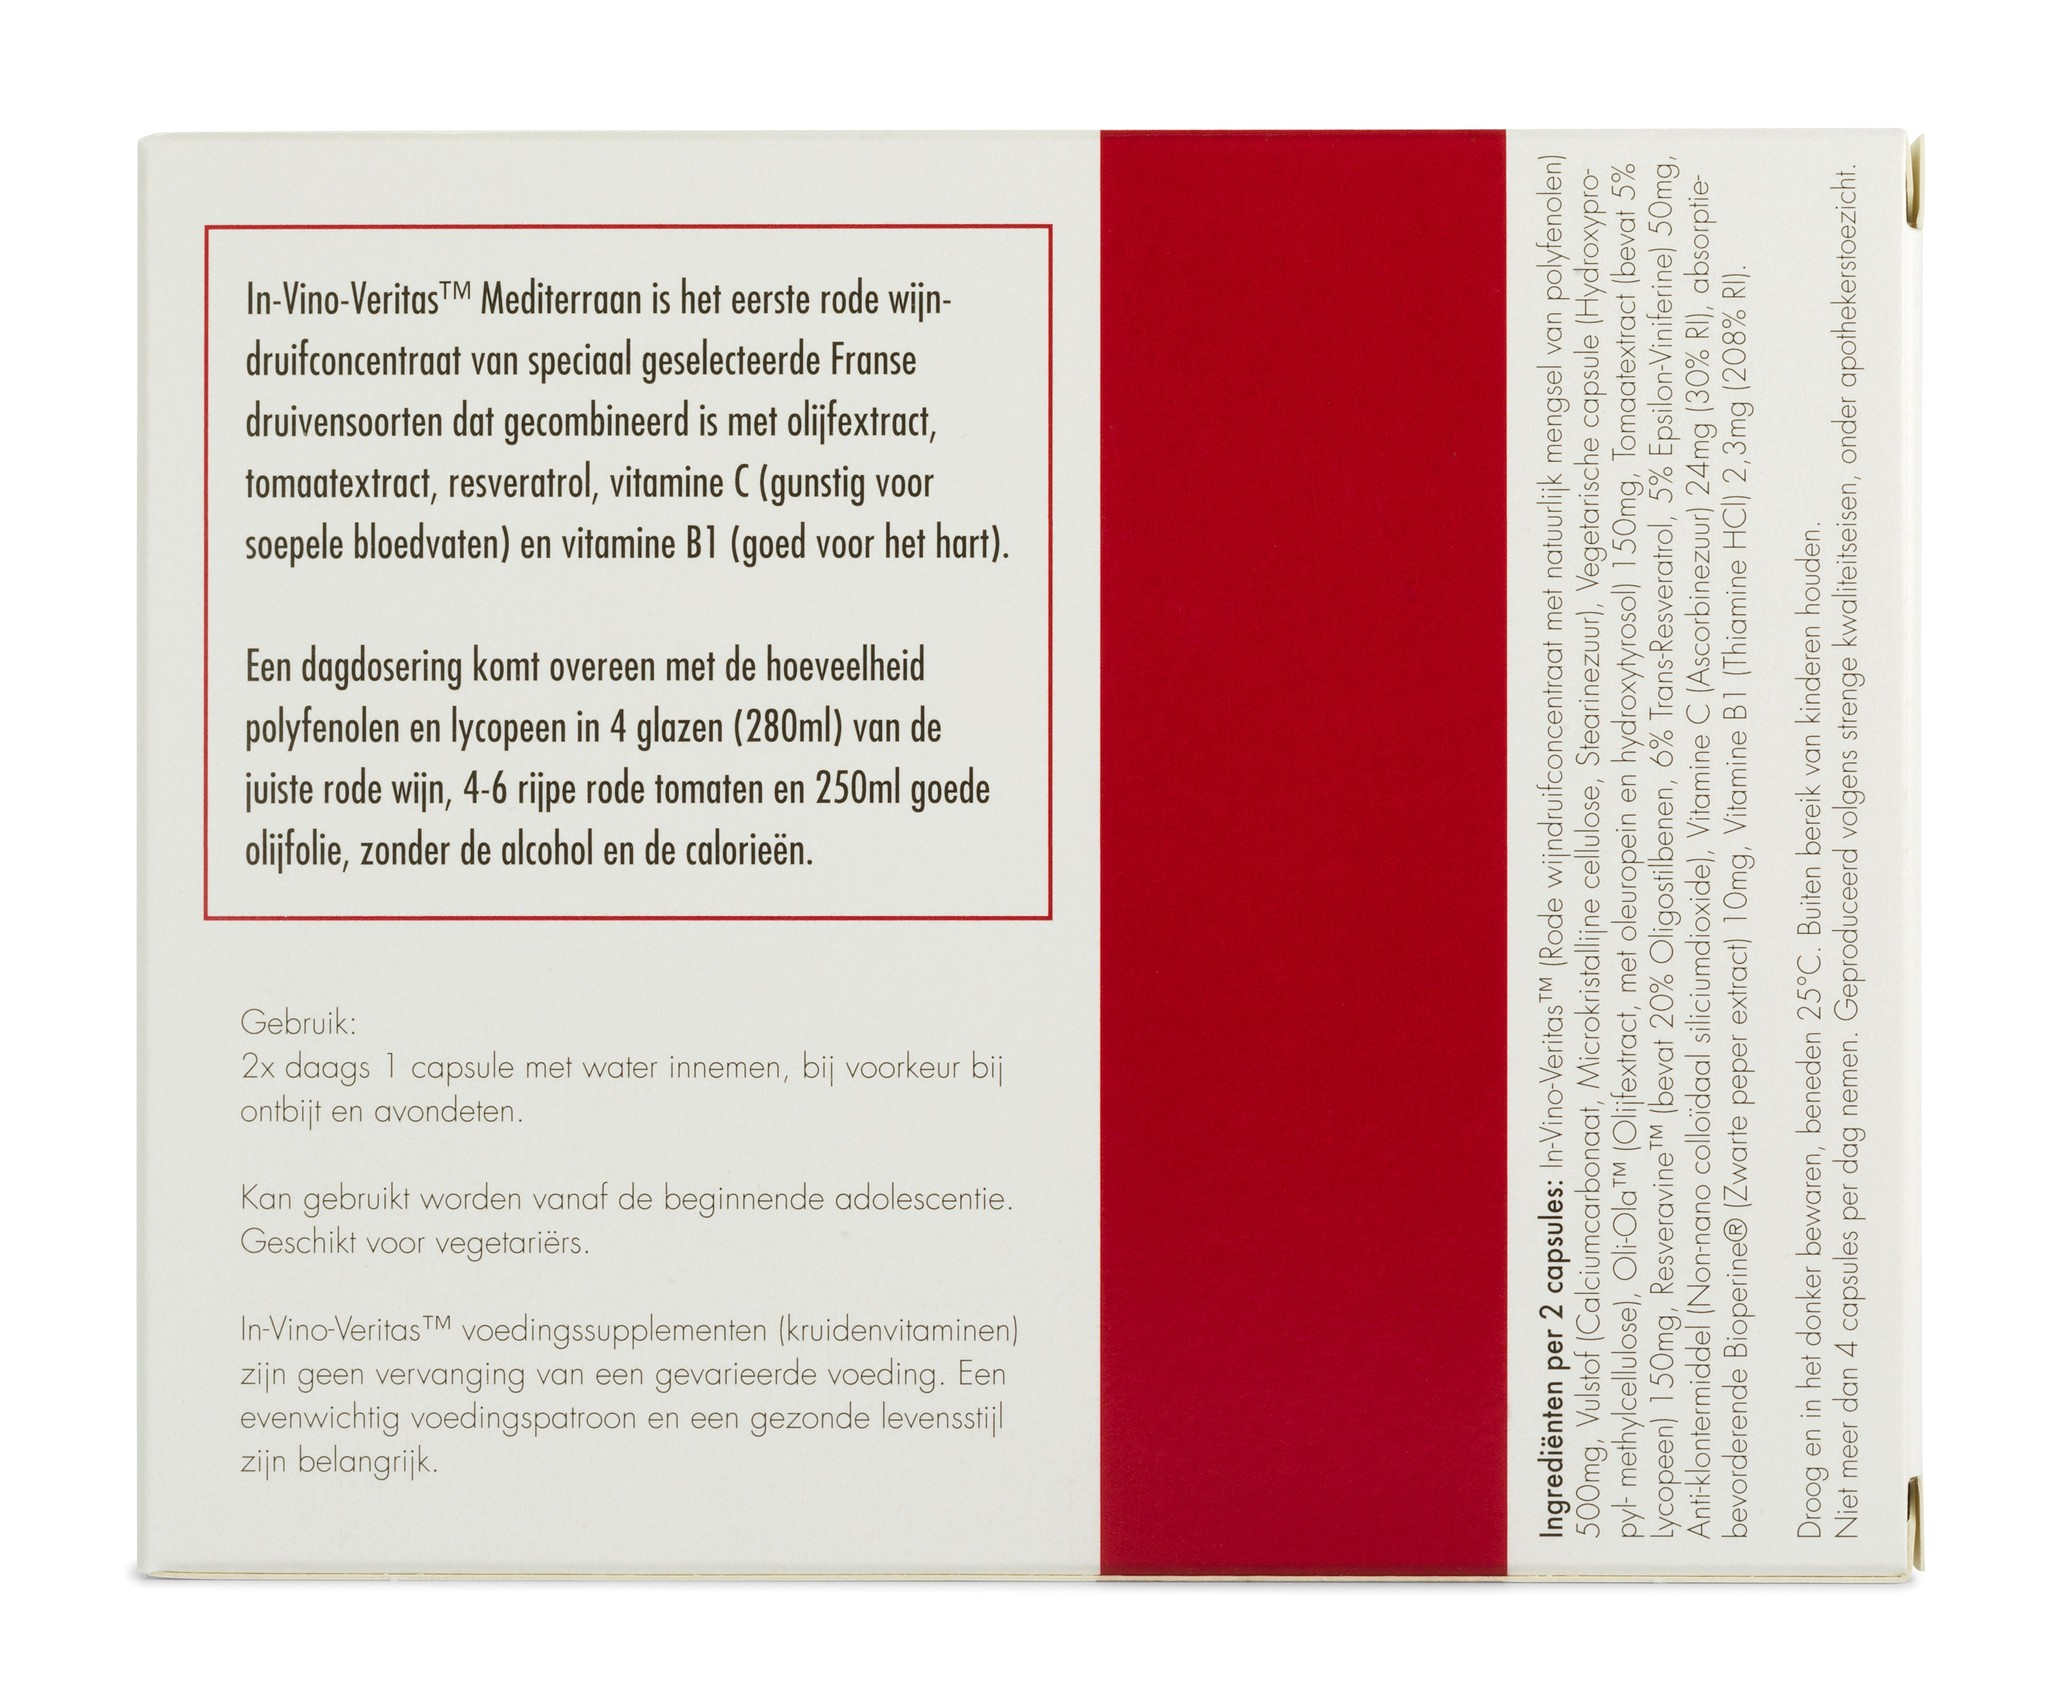 In-Vino-Veritas™ Mediterraan Halfjaaraanbieding (5% korting + Gratis Verzending)